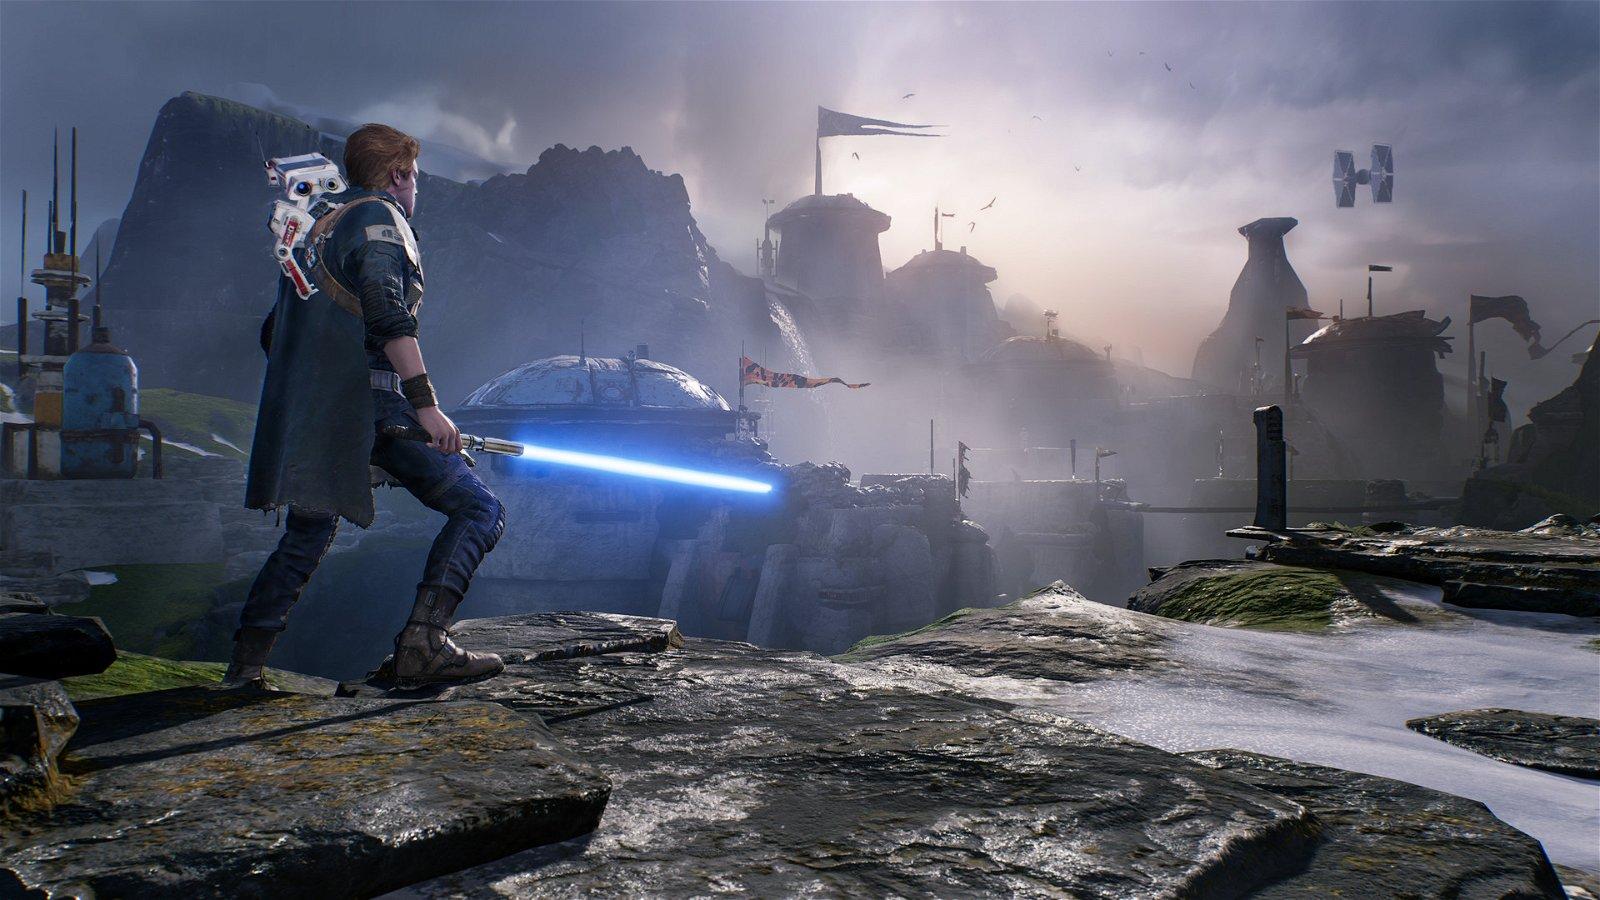 Star Wars Open World Game In Development With Ubisoft's Massive Entertainment 1